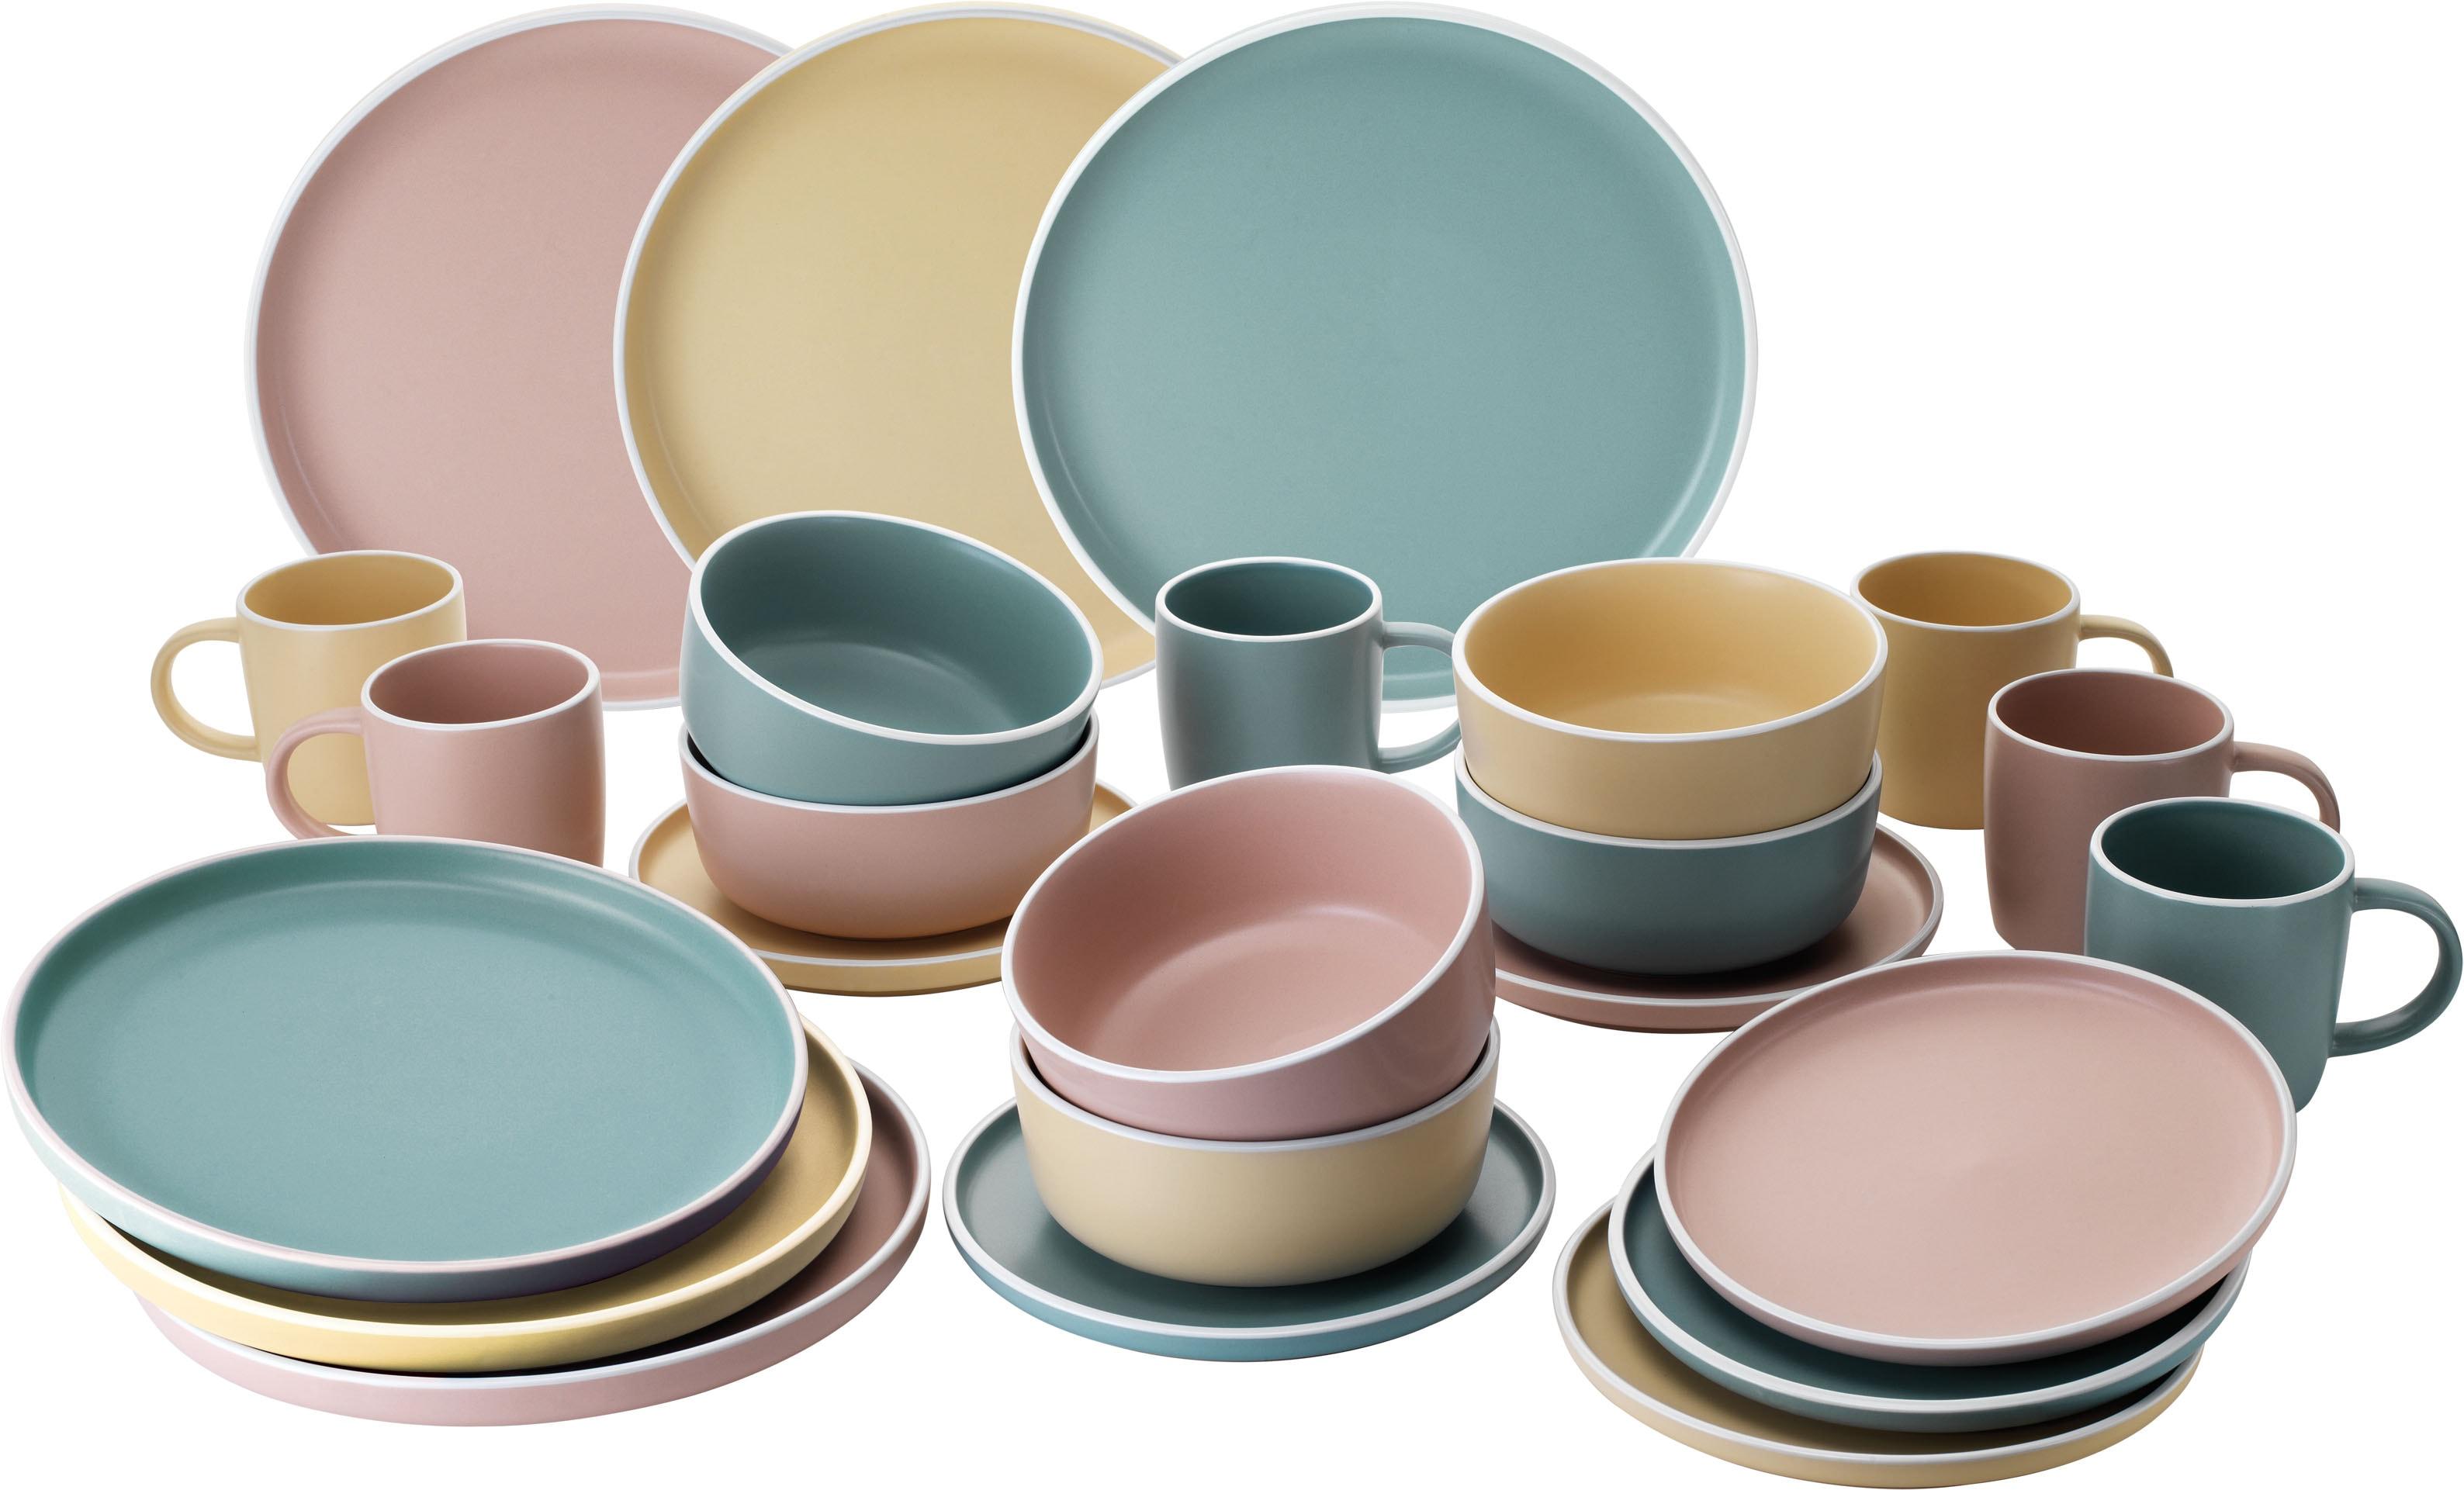 van Well Geschirr-Set Lina, (Set, 24 tlg.), Mix aus 3 Farben bunt Geschirr-Sets Geschirr, Porzellan Tischaccessoires Haushaltswaren